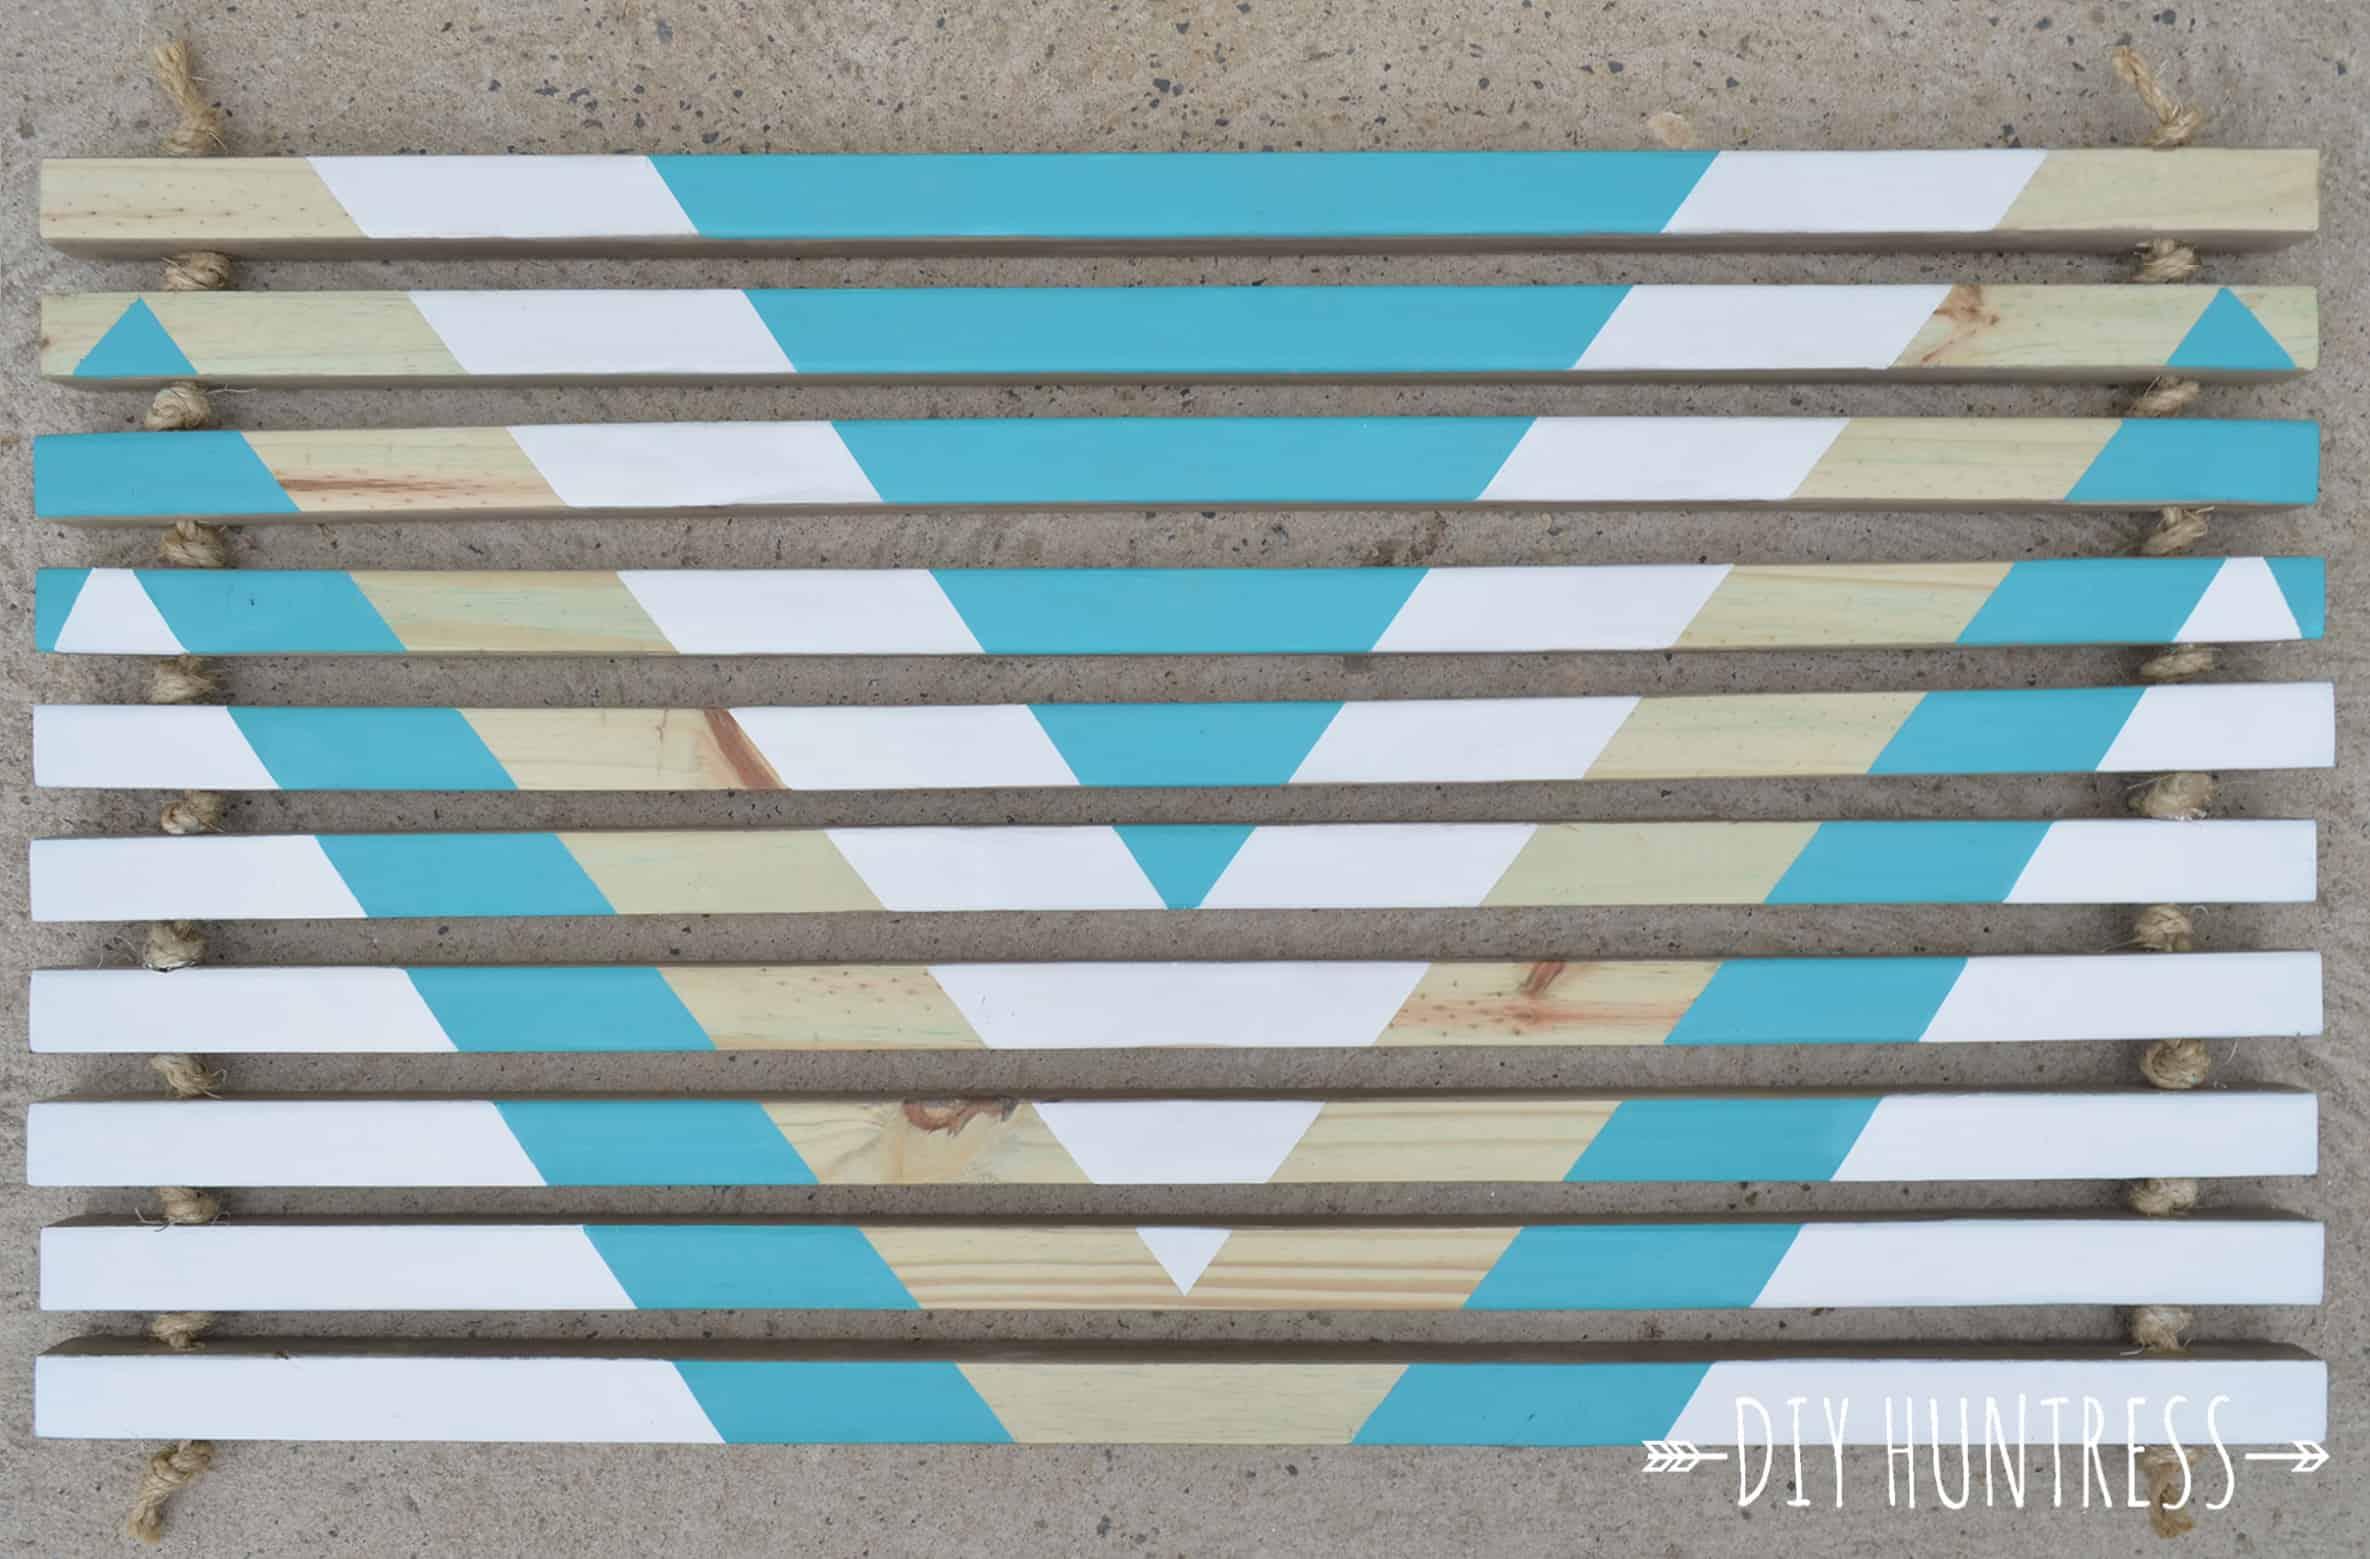 DIY_Huntress_Doormat_Home_Depot-13